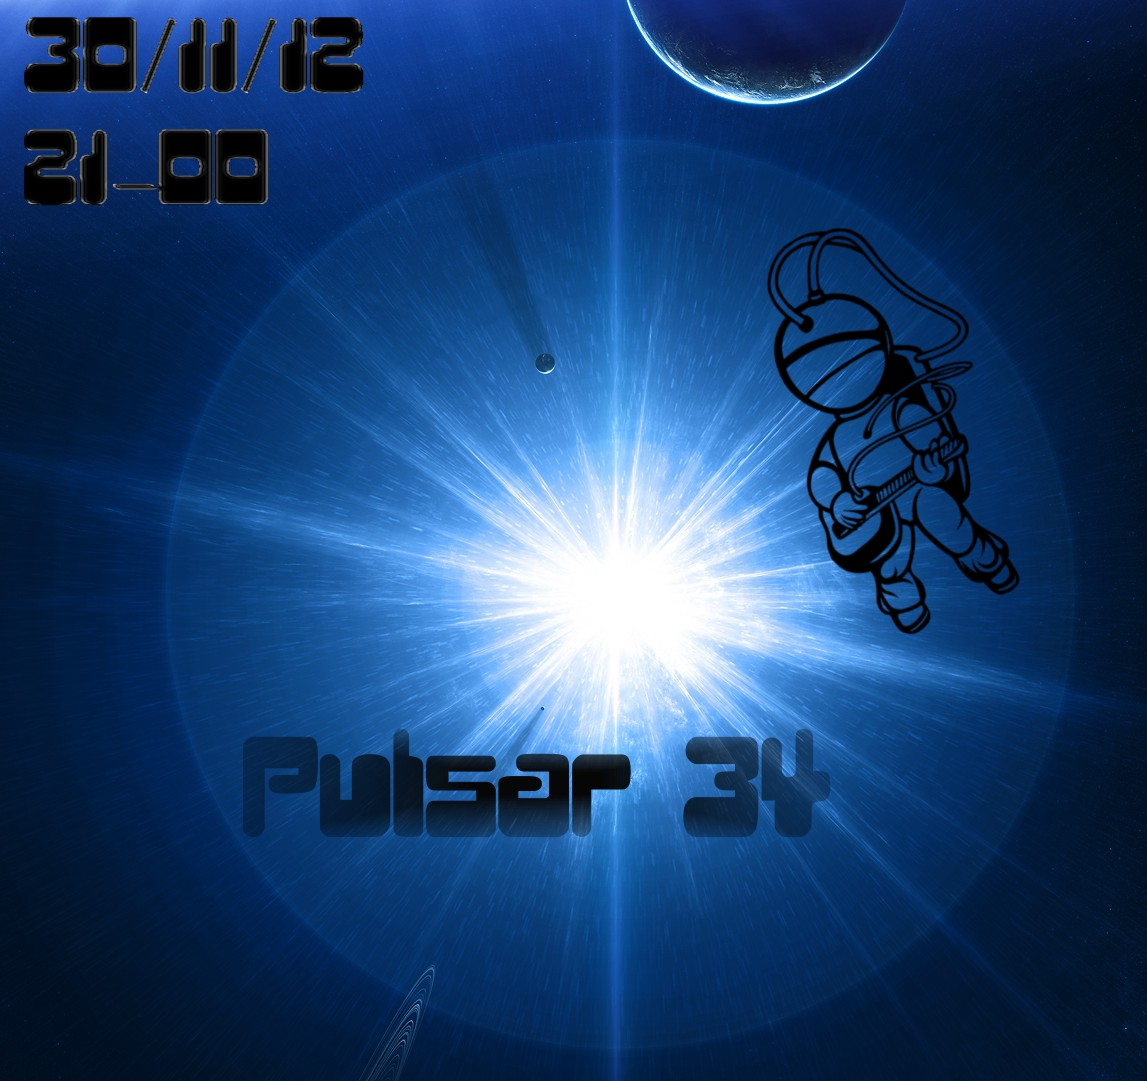 puls 2012-11-30